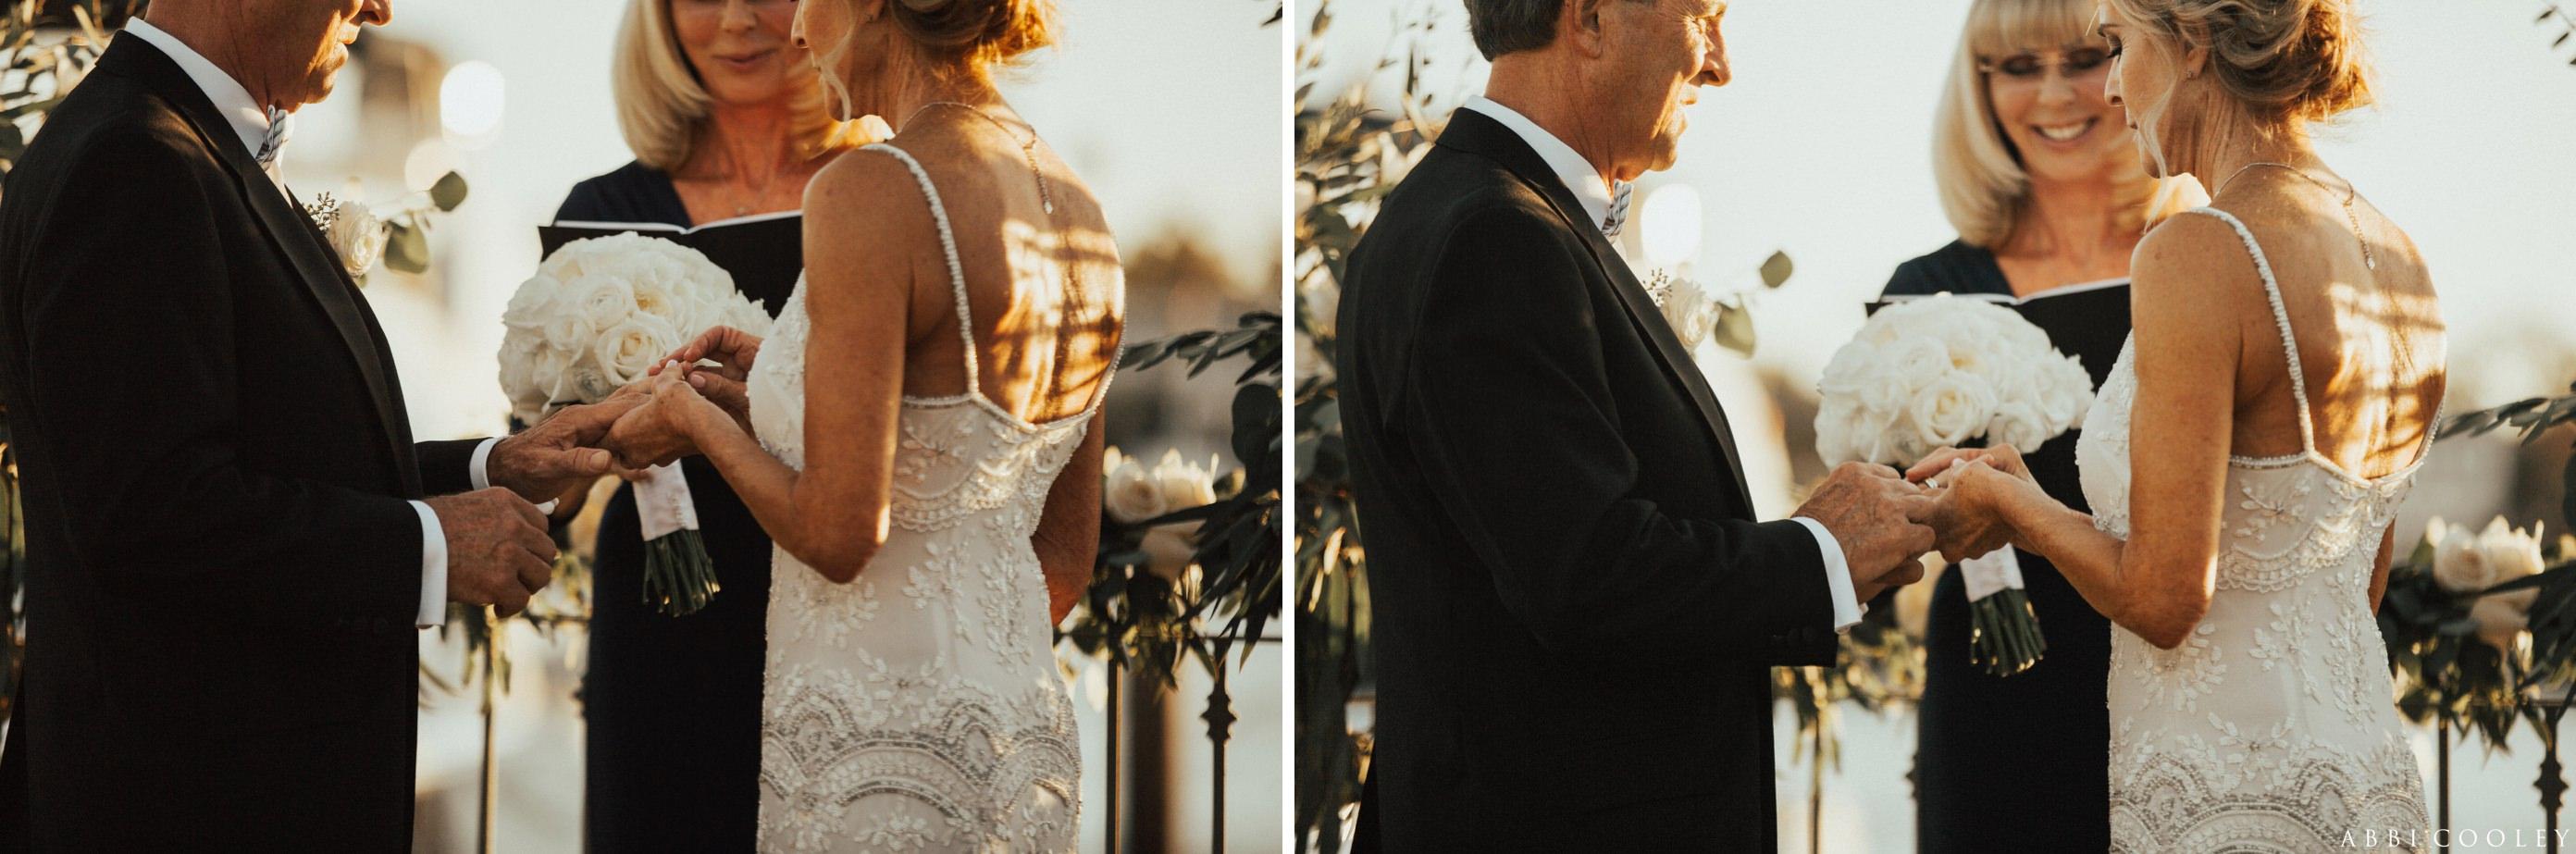 older couples say i do Balboa Bay Club Wedding